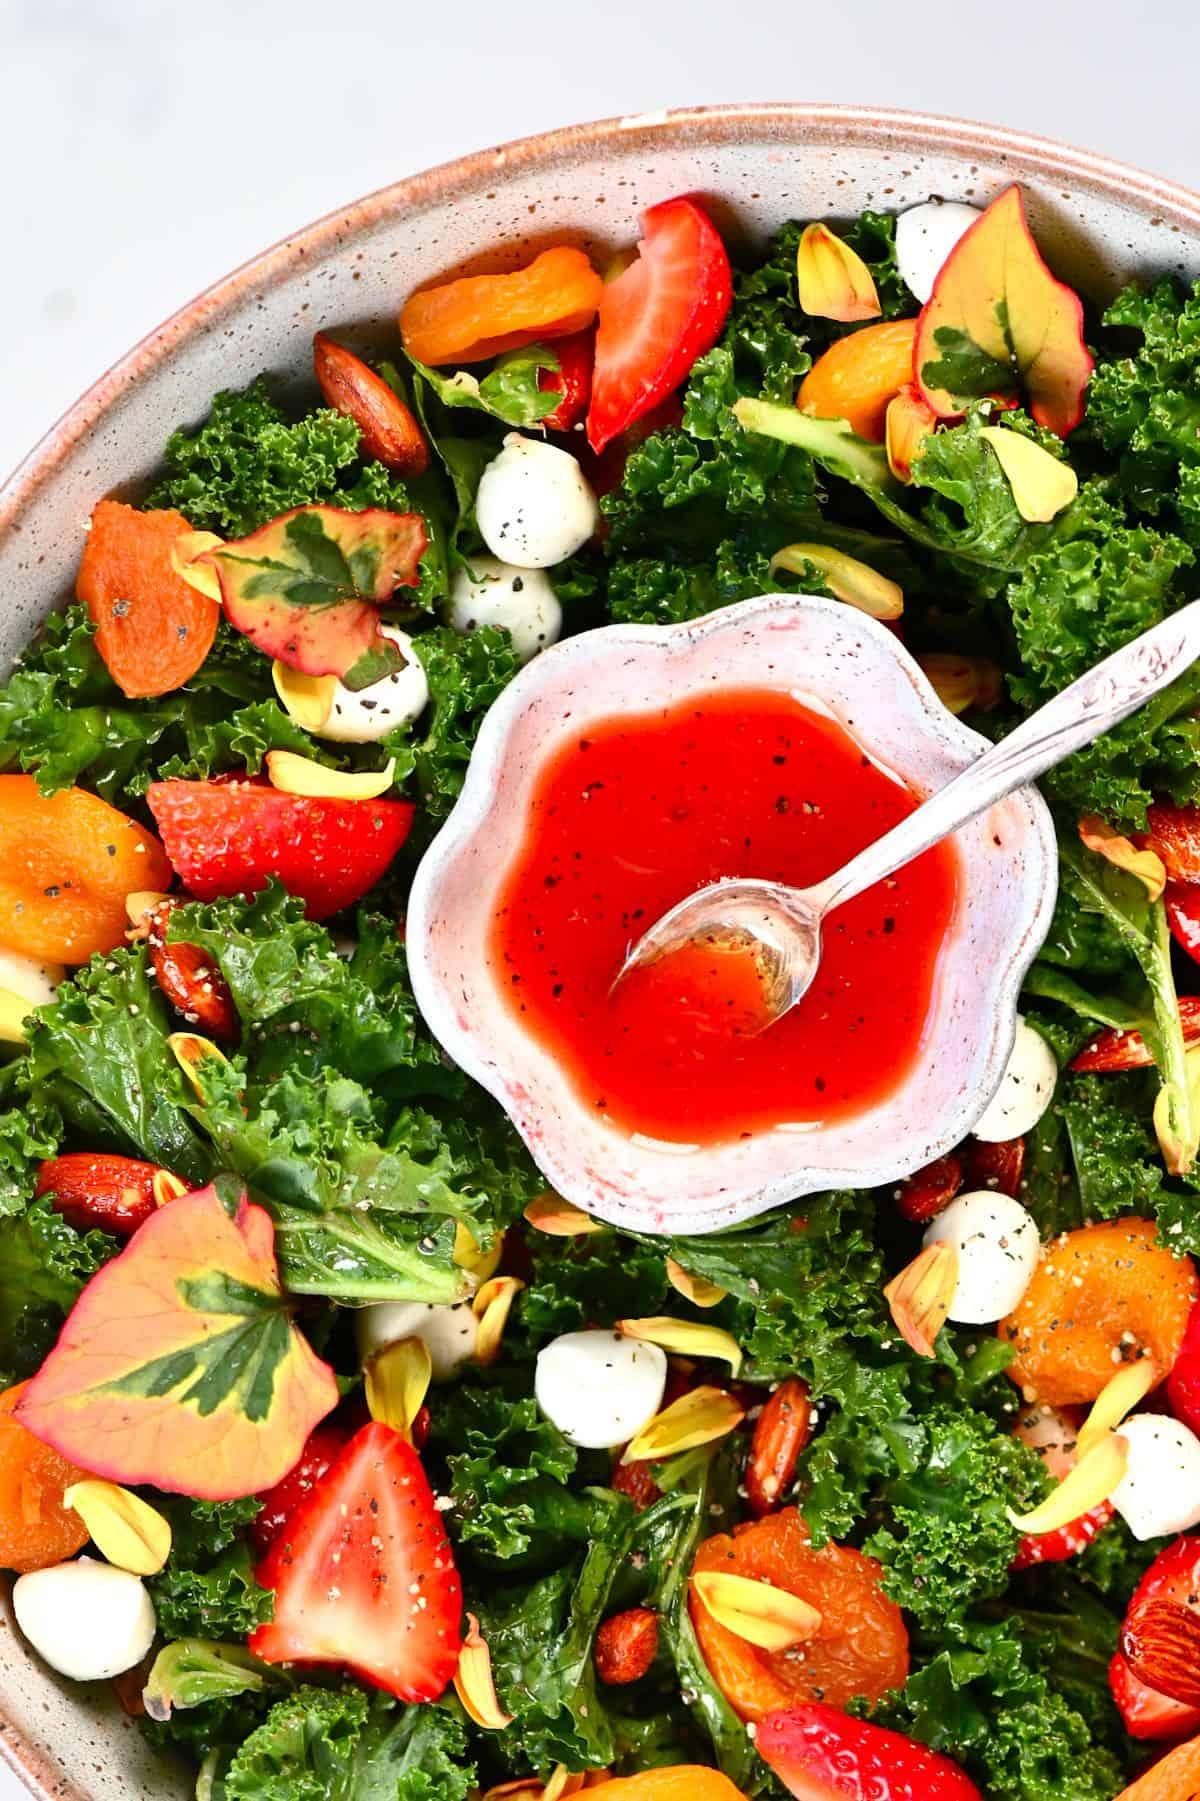 Strawberry small Salad dressing Bowl inside a salad bowl